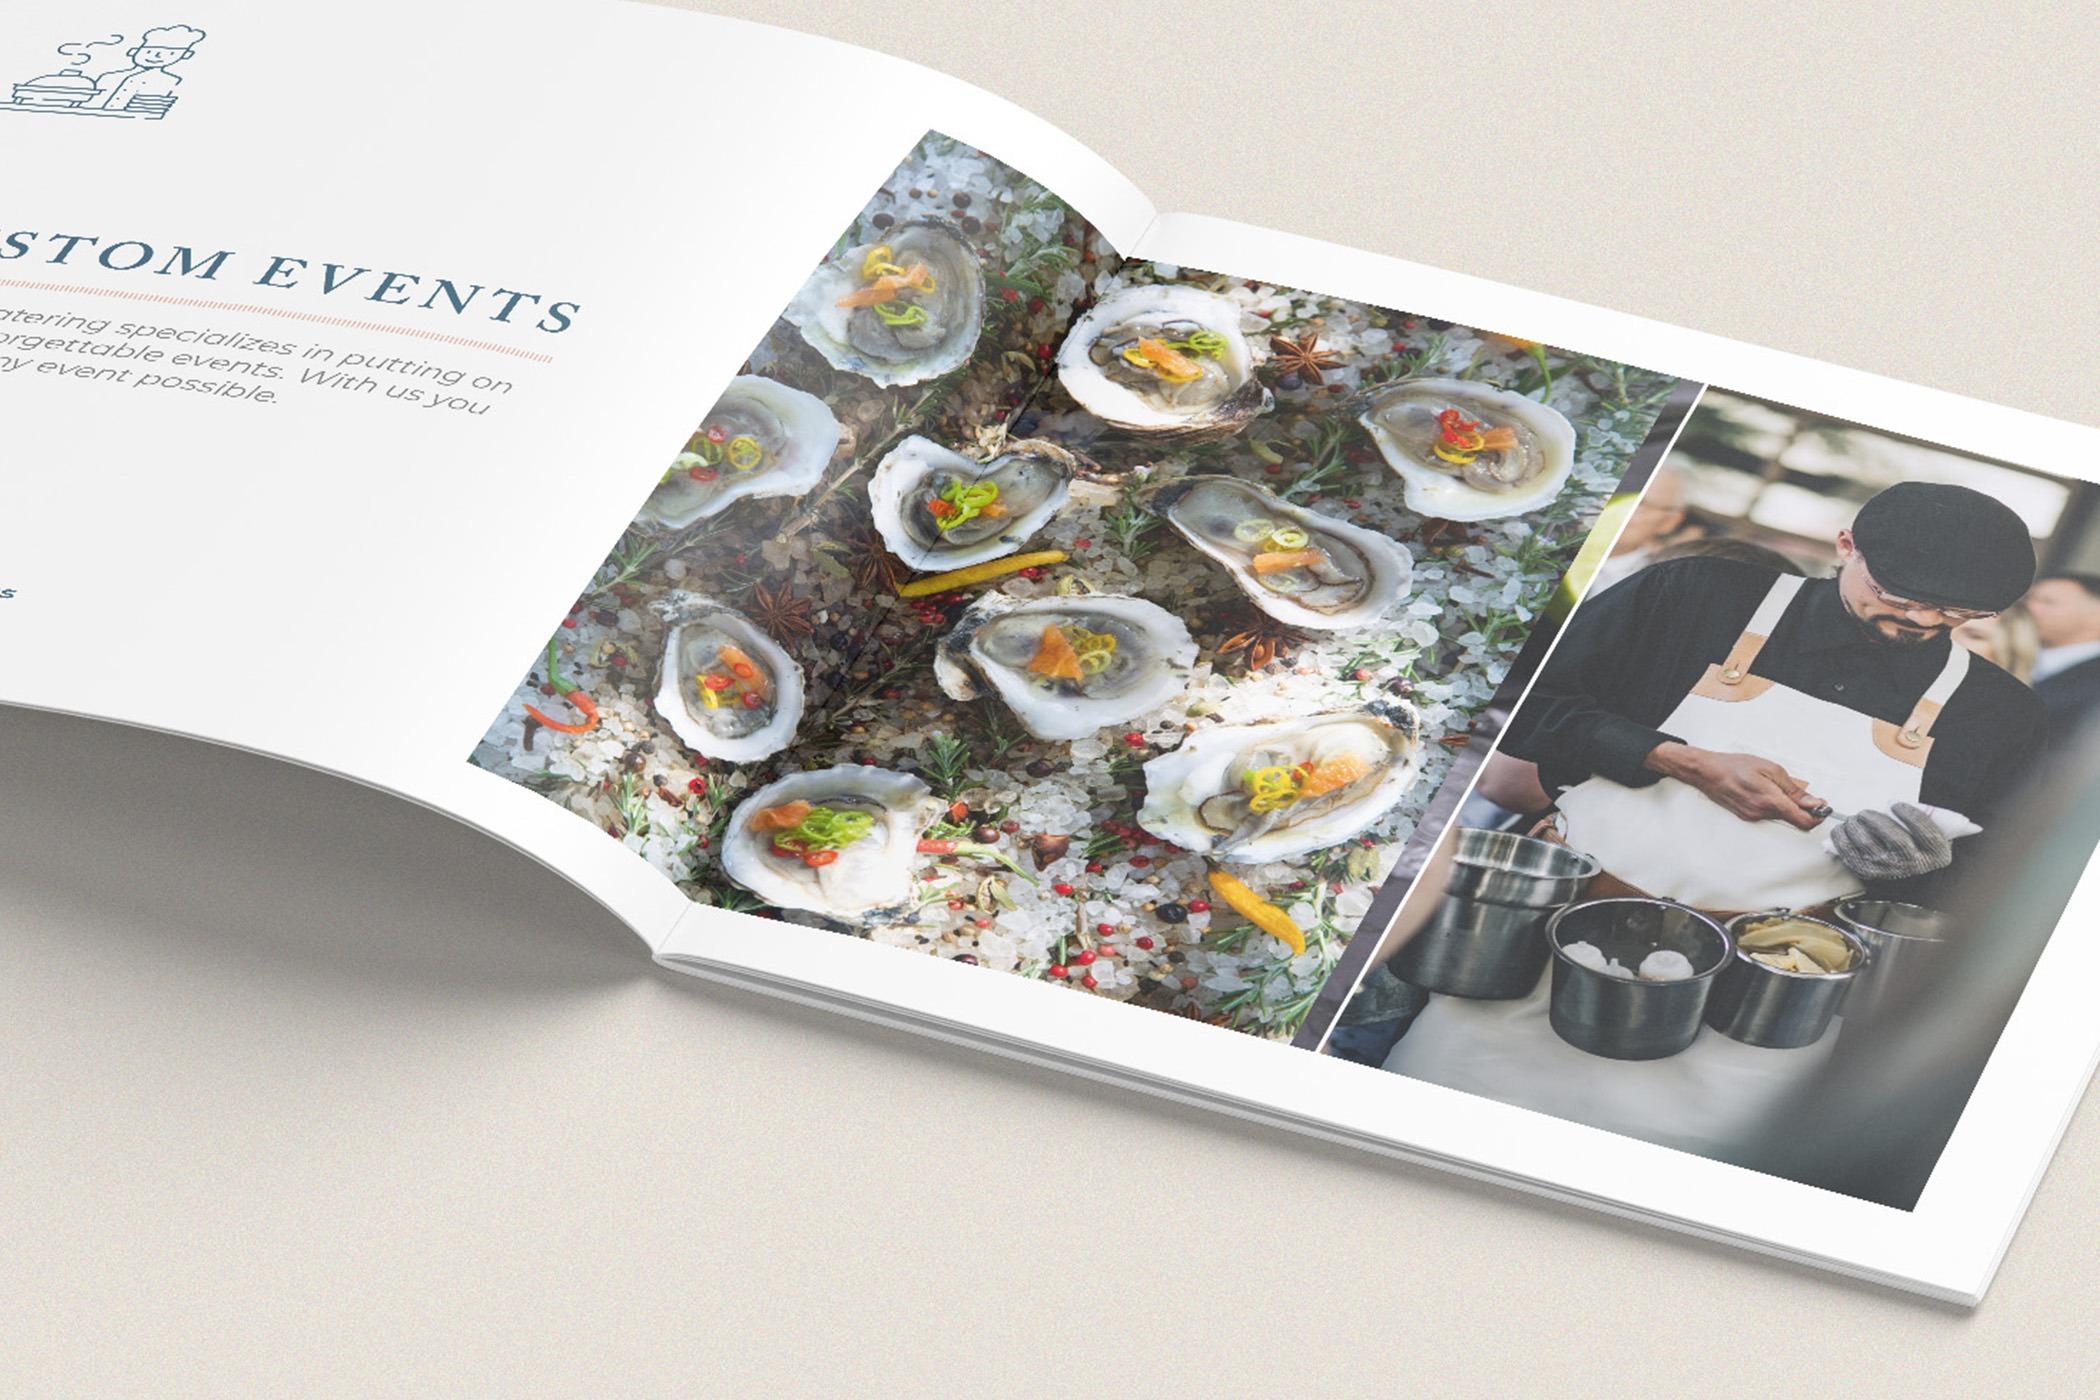 anar-tuuksam_catering-service-brochure-design_7